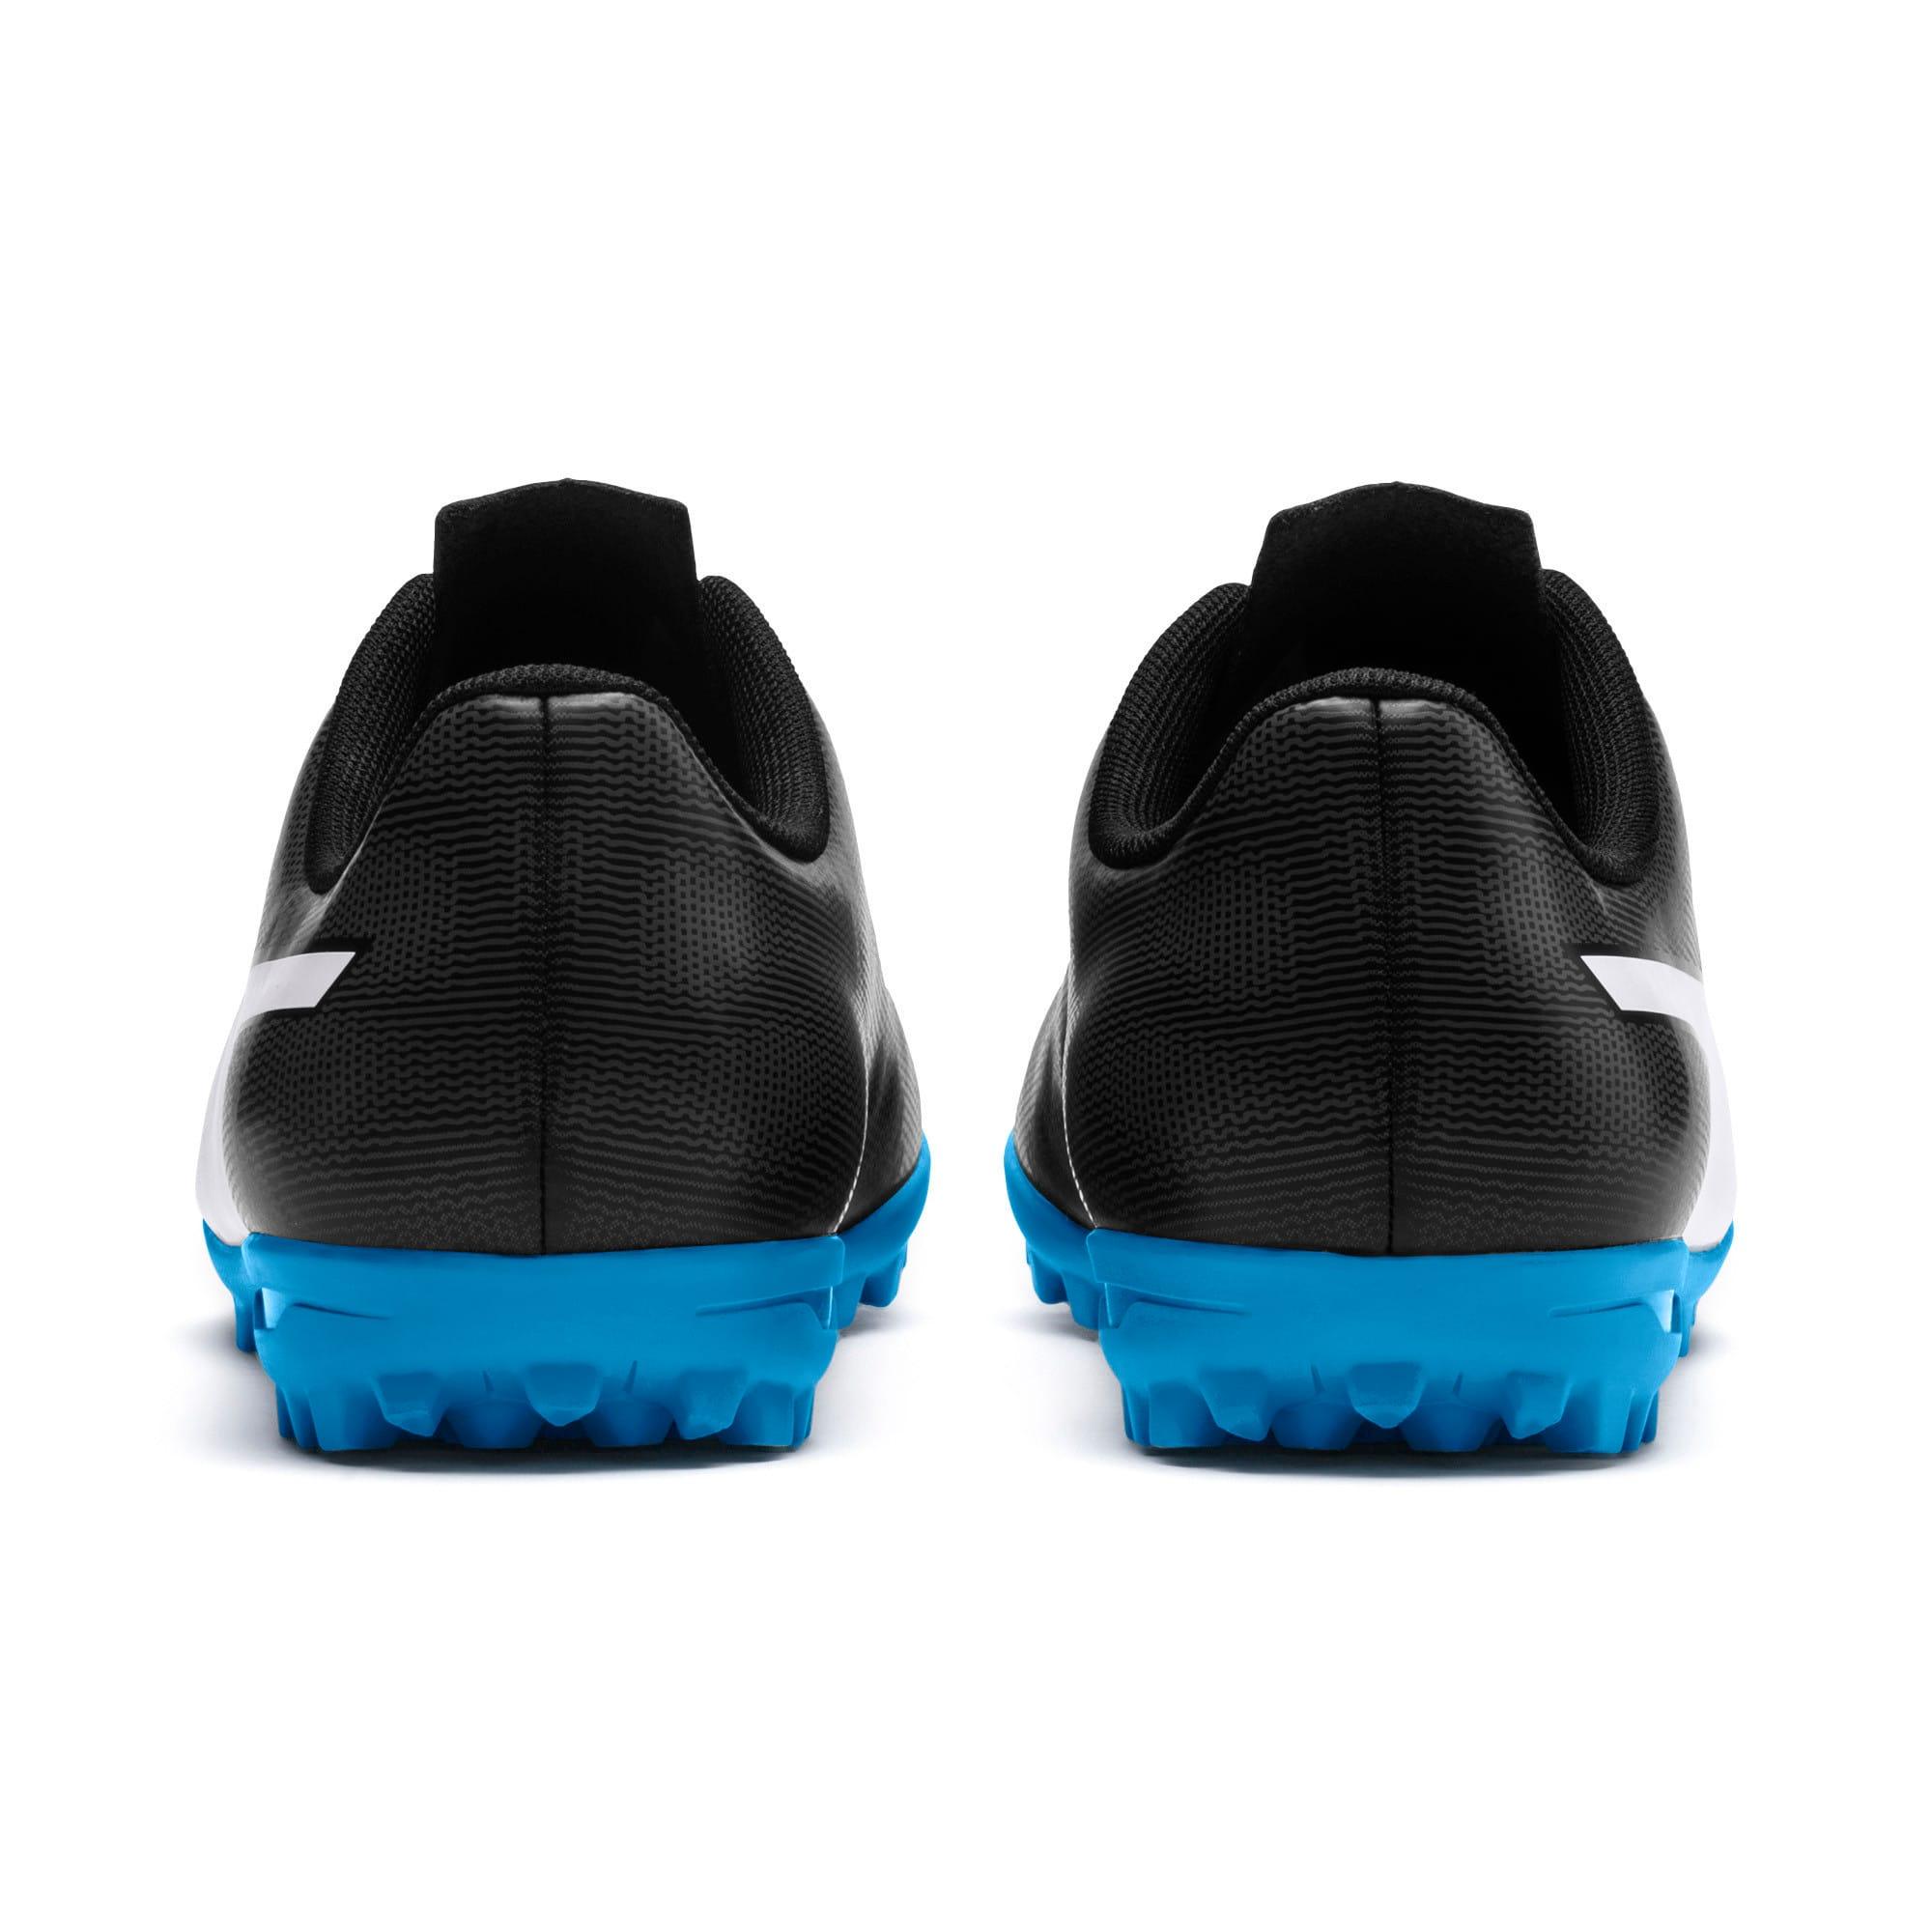 Thumbnail 3 of Rapido TT Youth Football Boots, Black-White-Iron Gate-Bleu, medium-IND